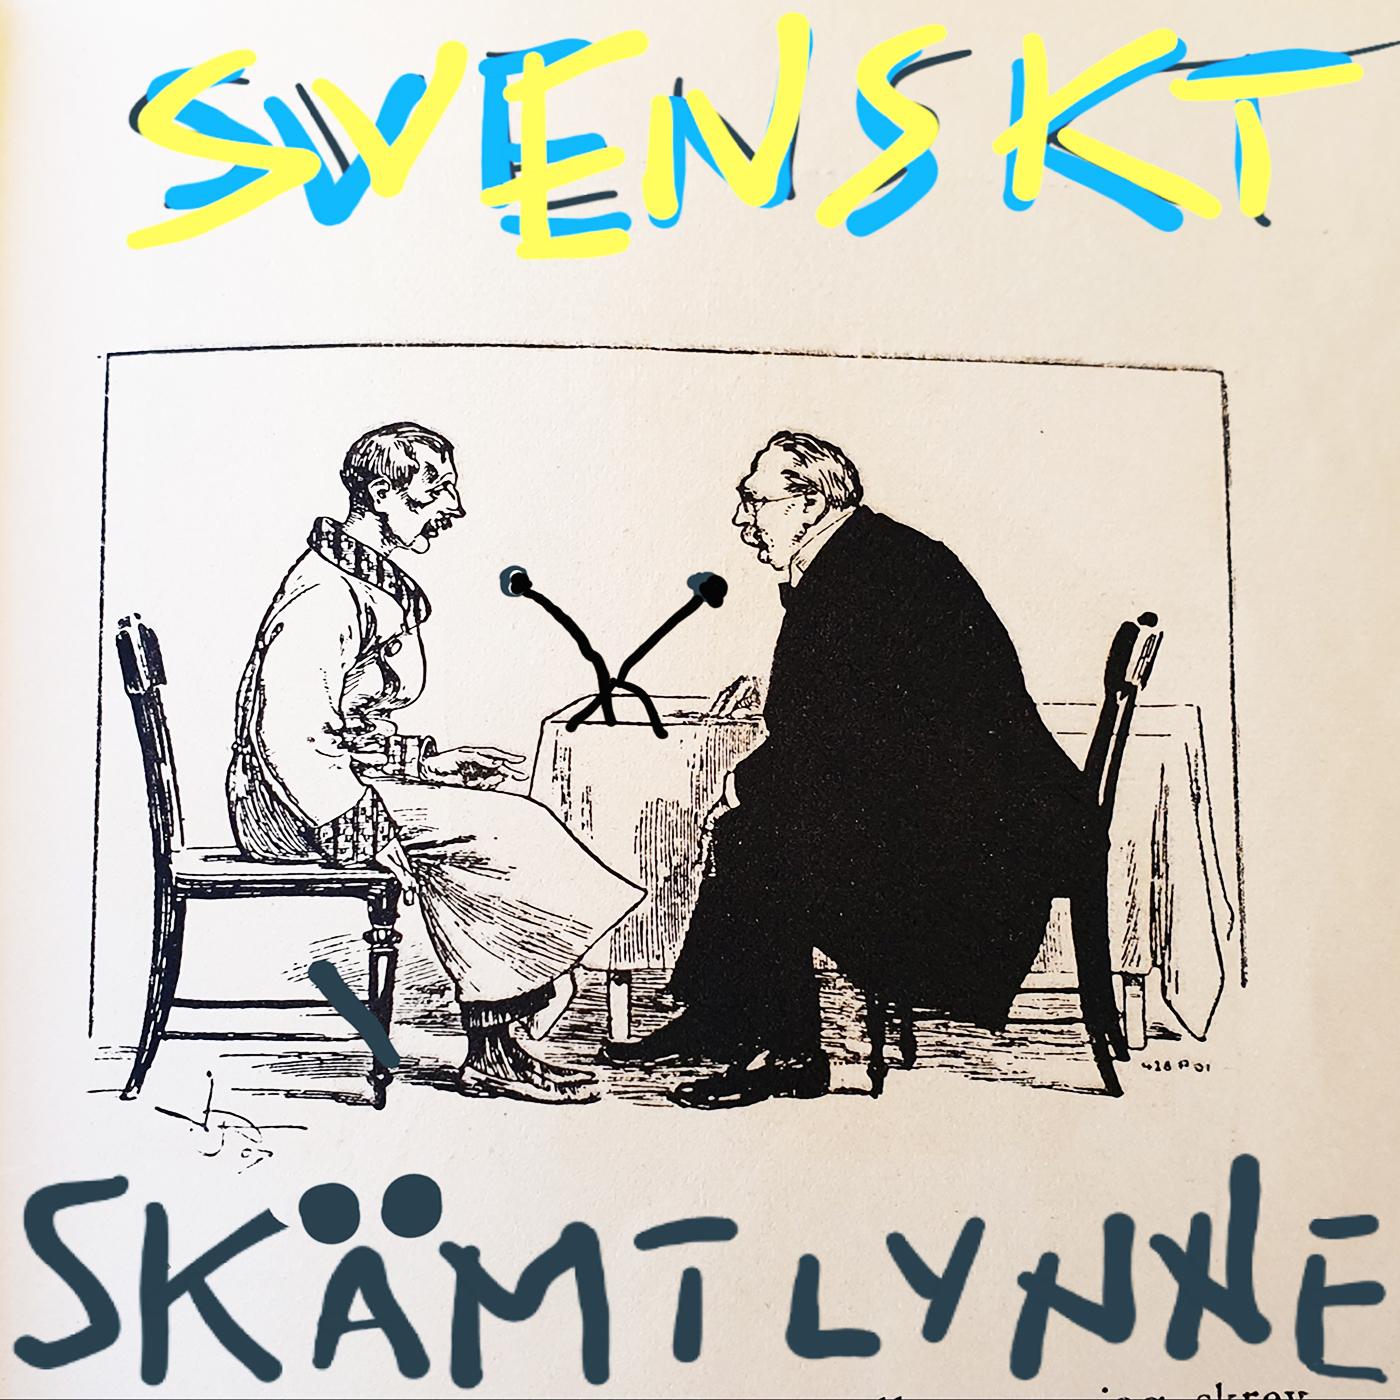 Svenskt Skämtlynne ep 105